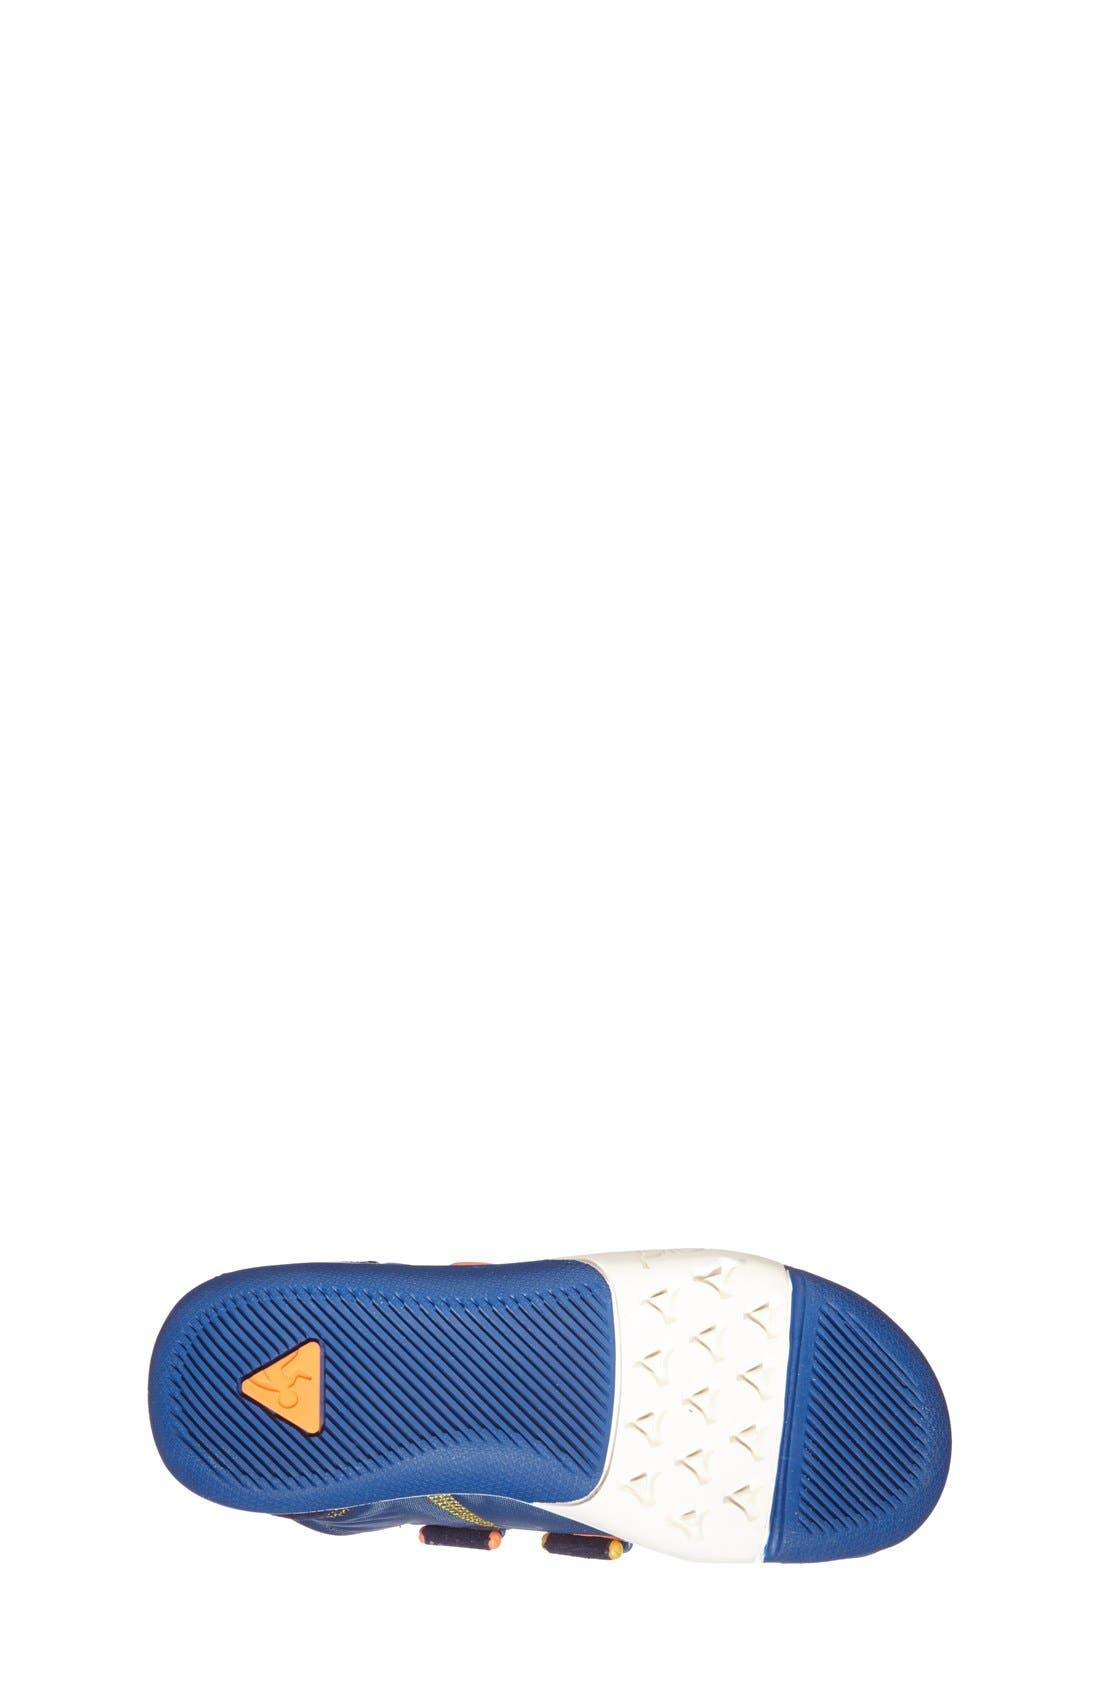 'Ty' Customizable Sneaker,                             Alternate thumbnail 4, color,                             Dark Blue